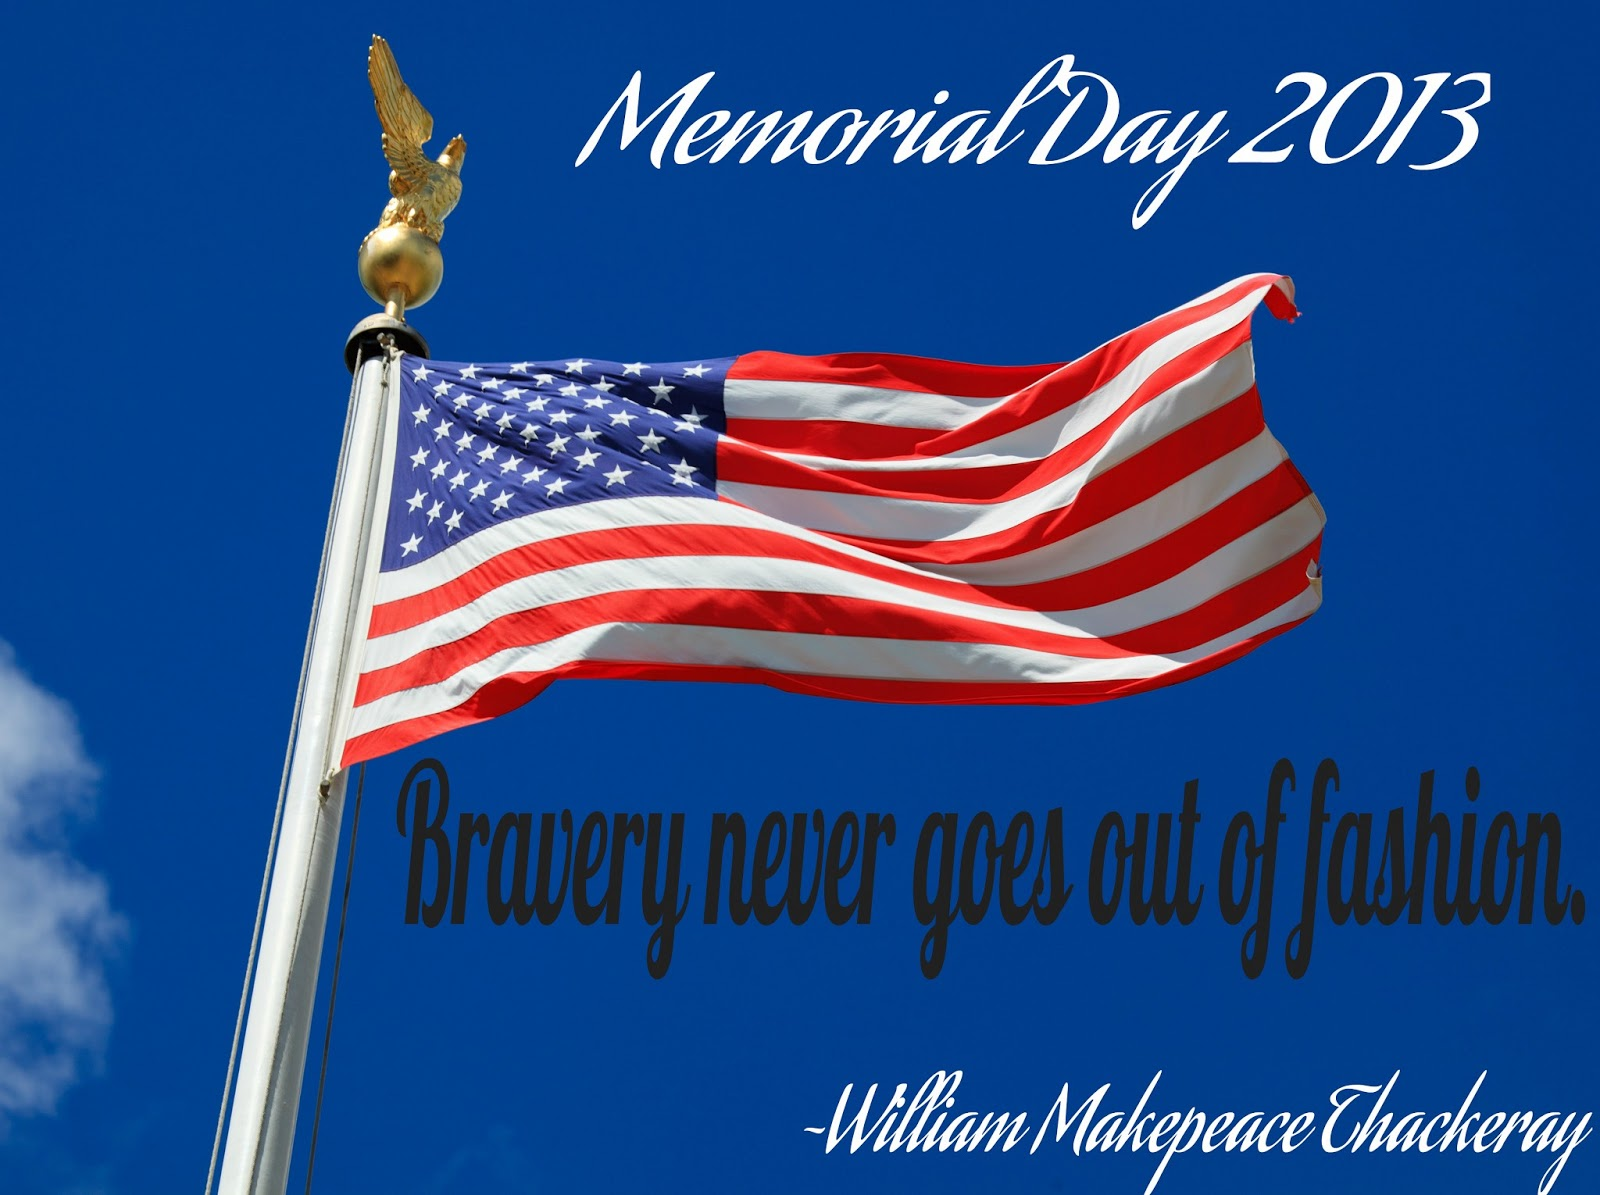 Happy Memorial Day 2013